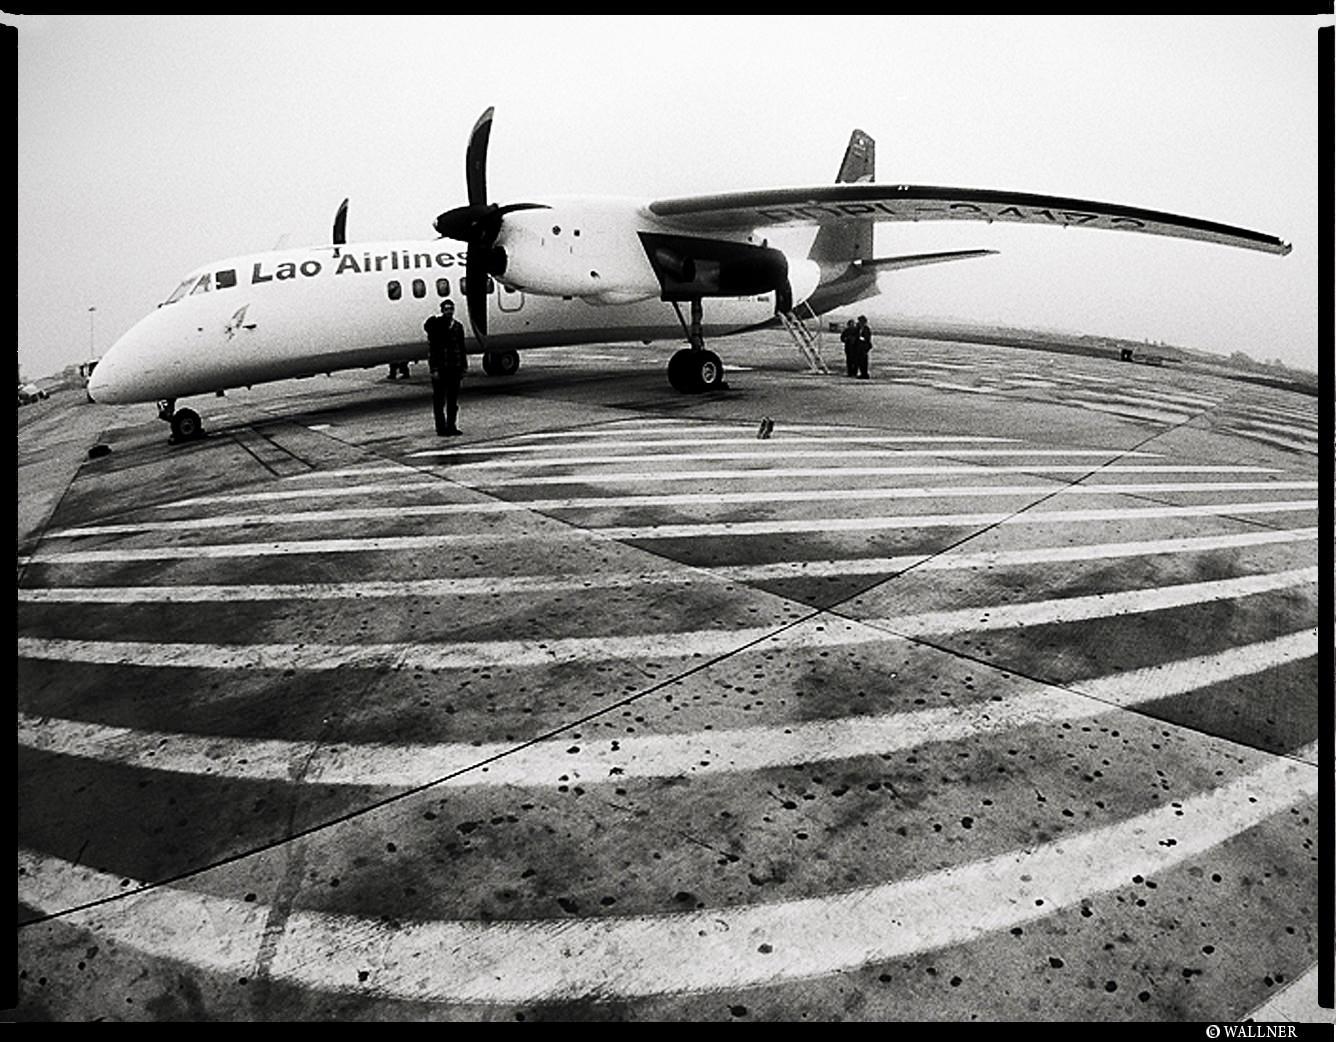 MediumFormatPatrikWallner_Airport_GettingOnPlaneLOWQ